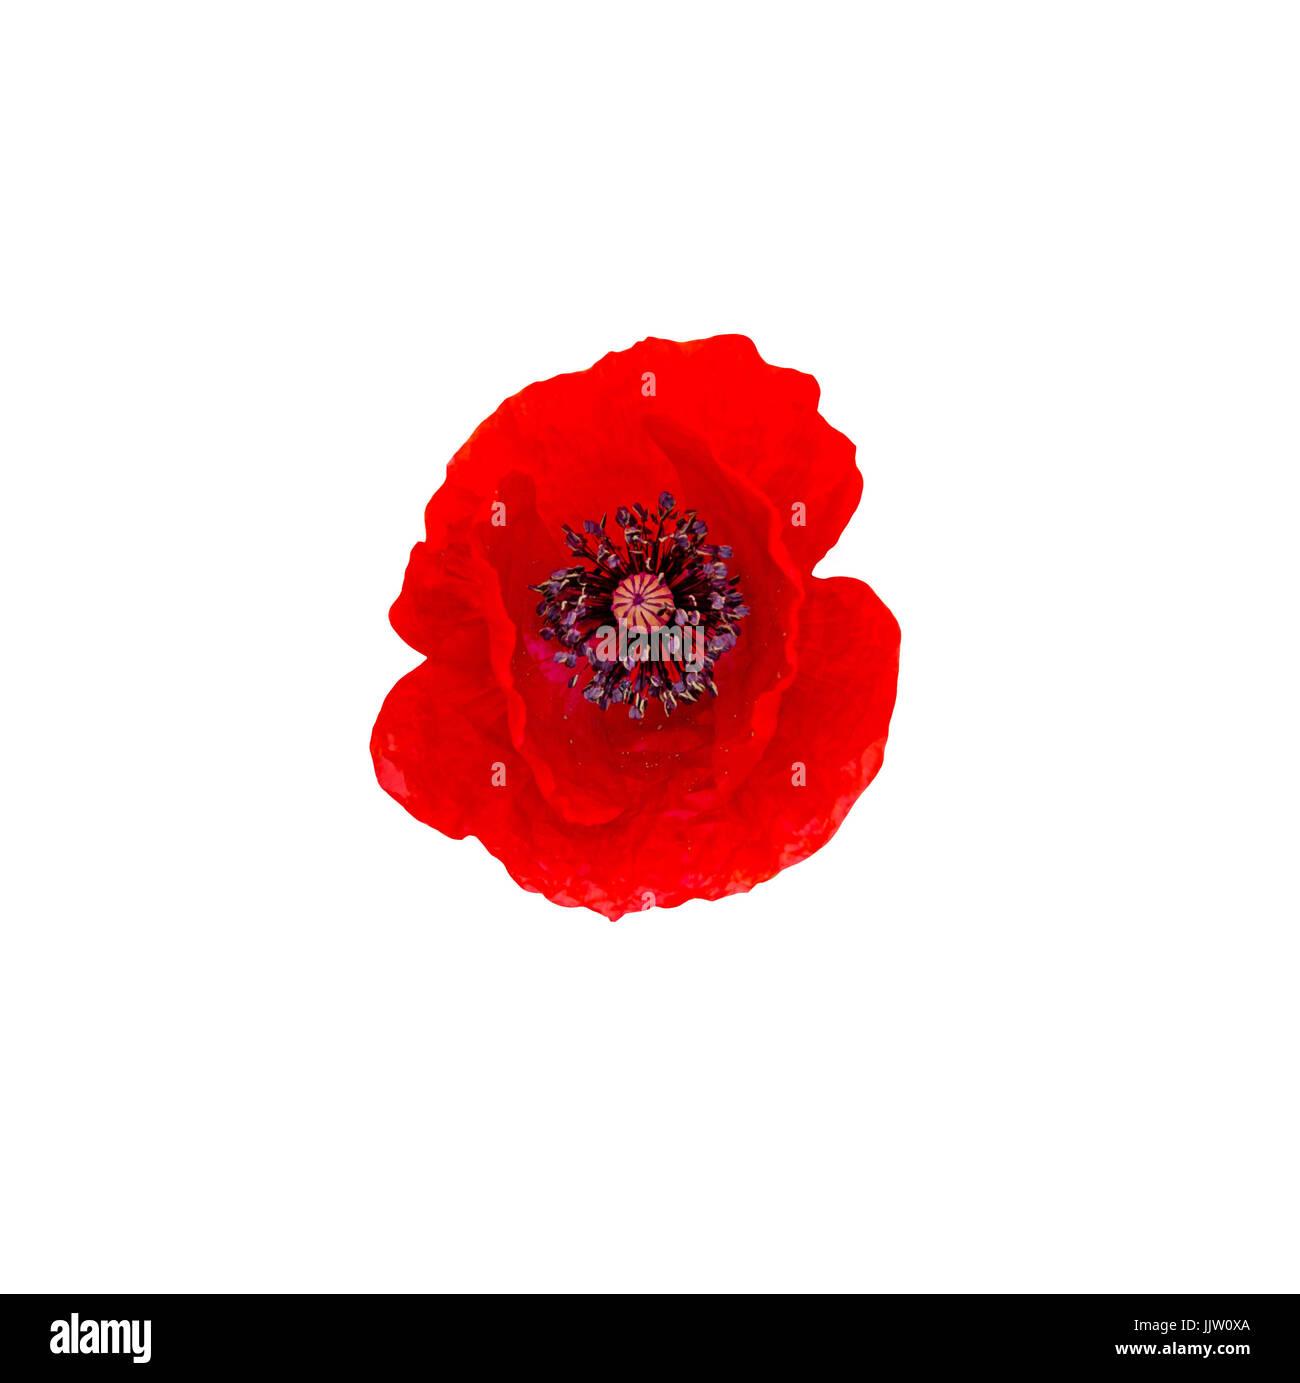 Red wild flower of Papaver rhoeas (corn poppy, corn rose, field poppy), isolated on white. - Stock Image